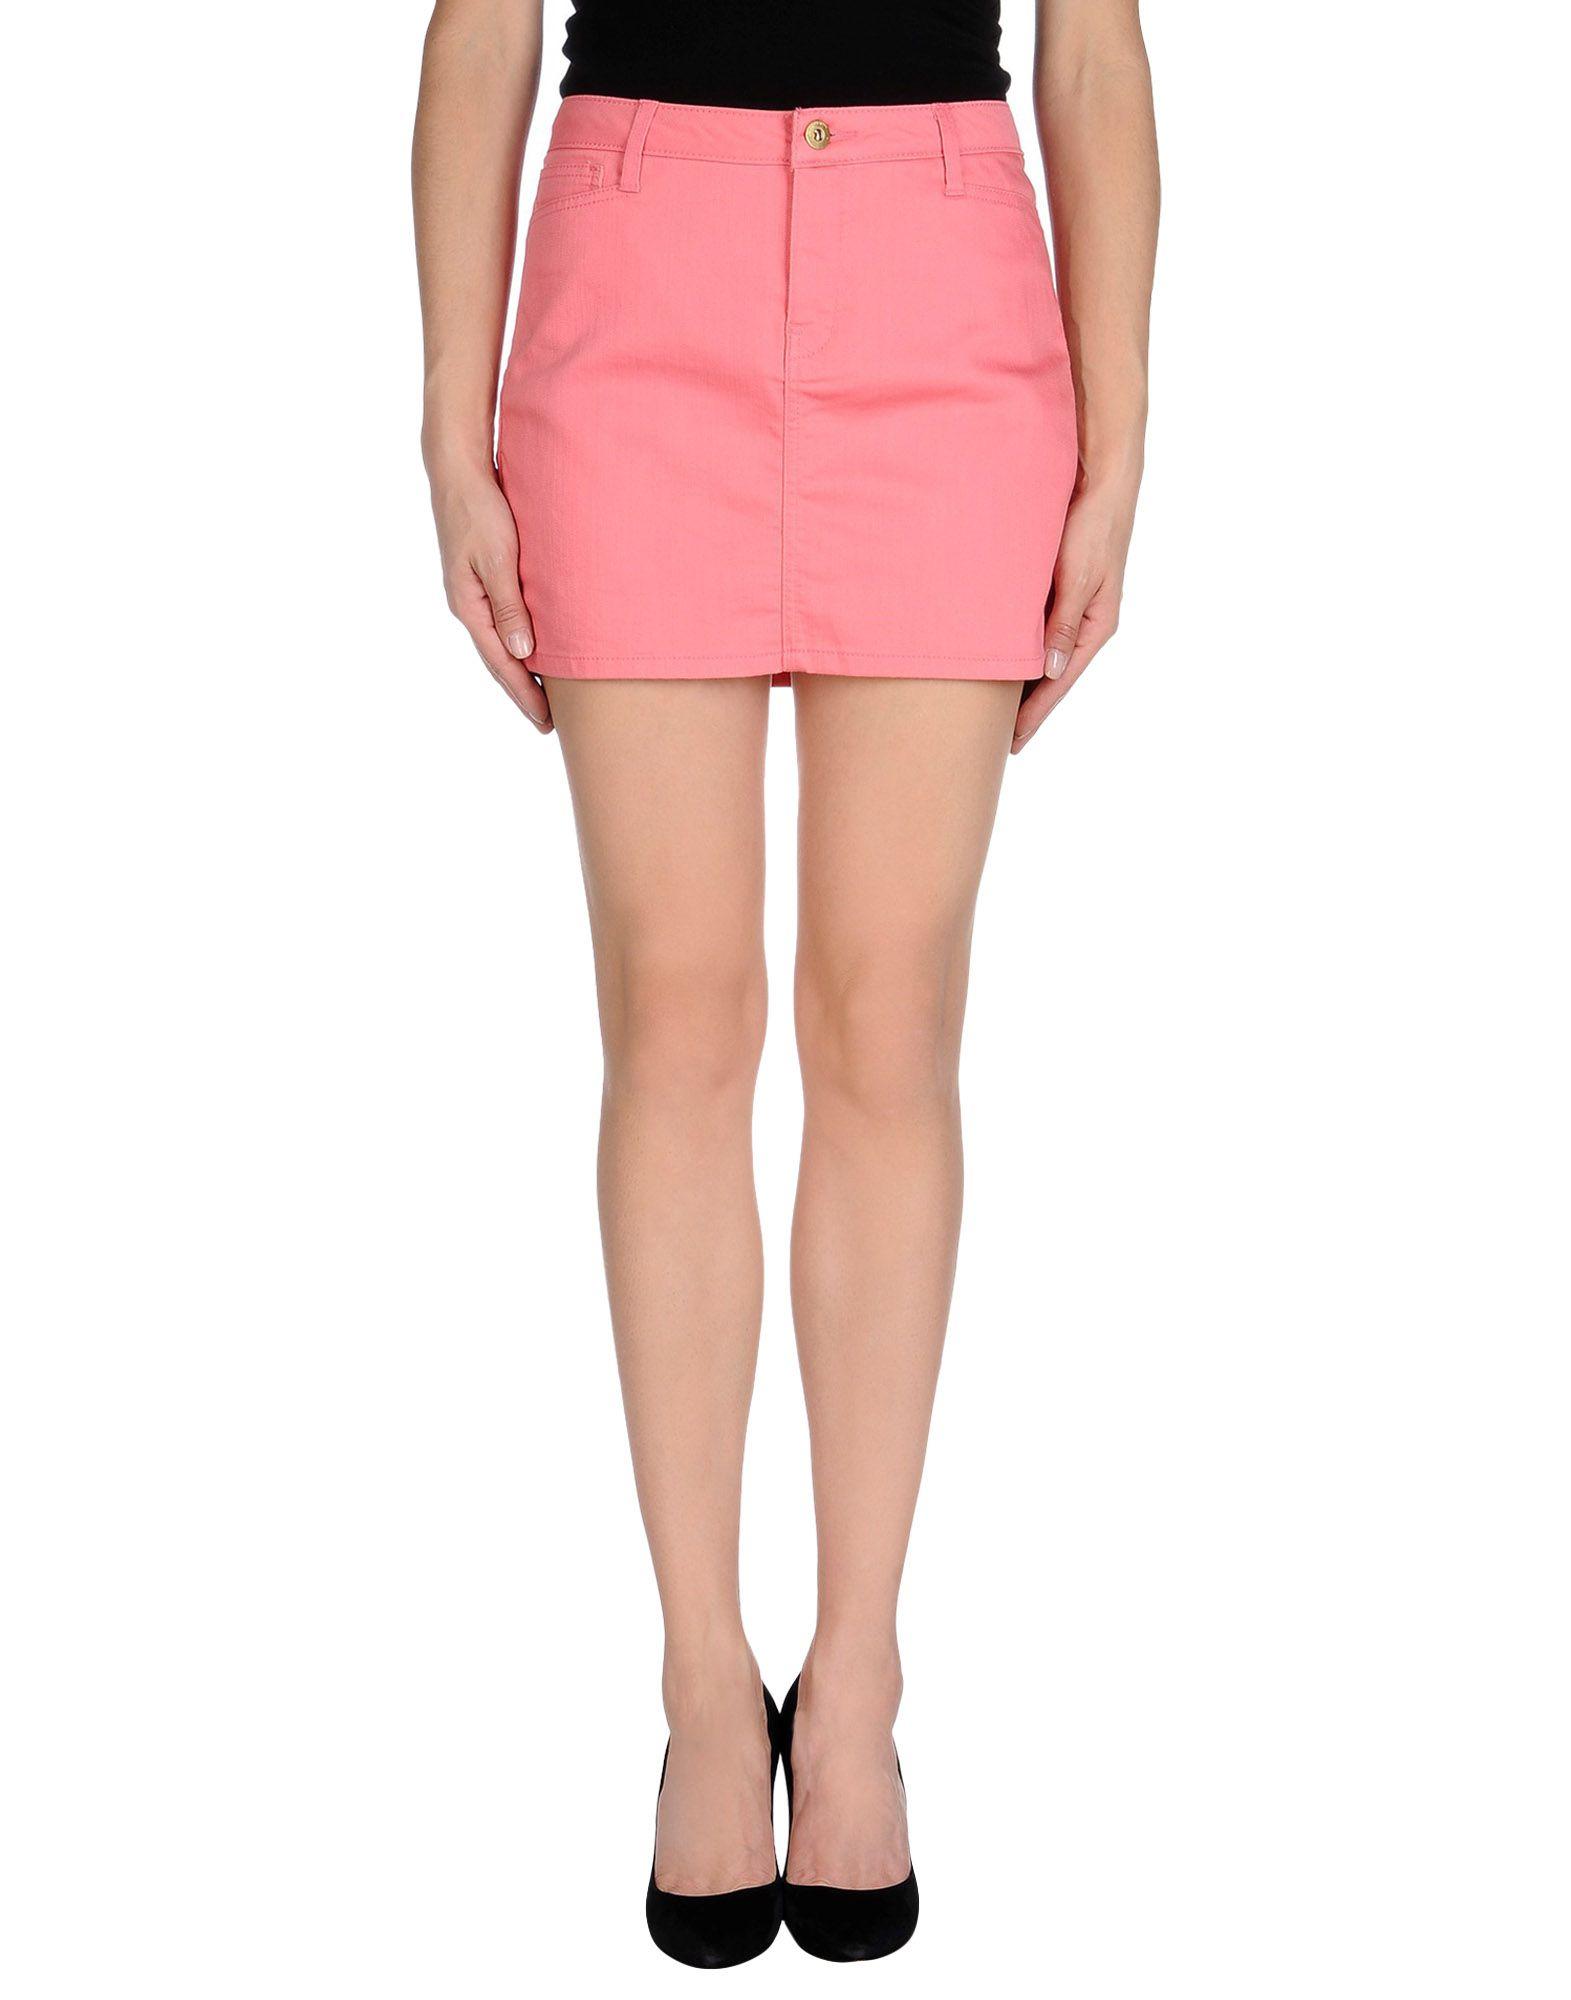 Vero moda Mini Skirt in Pink | Lyst